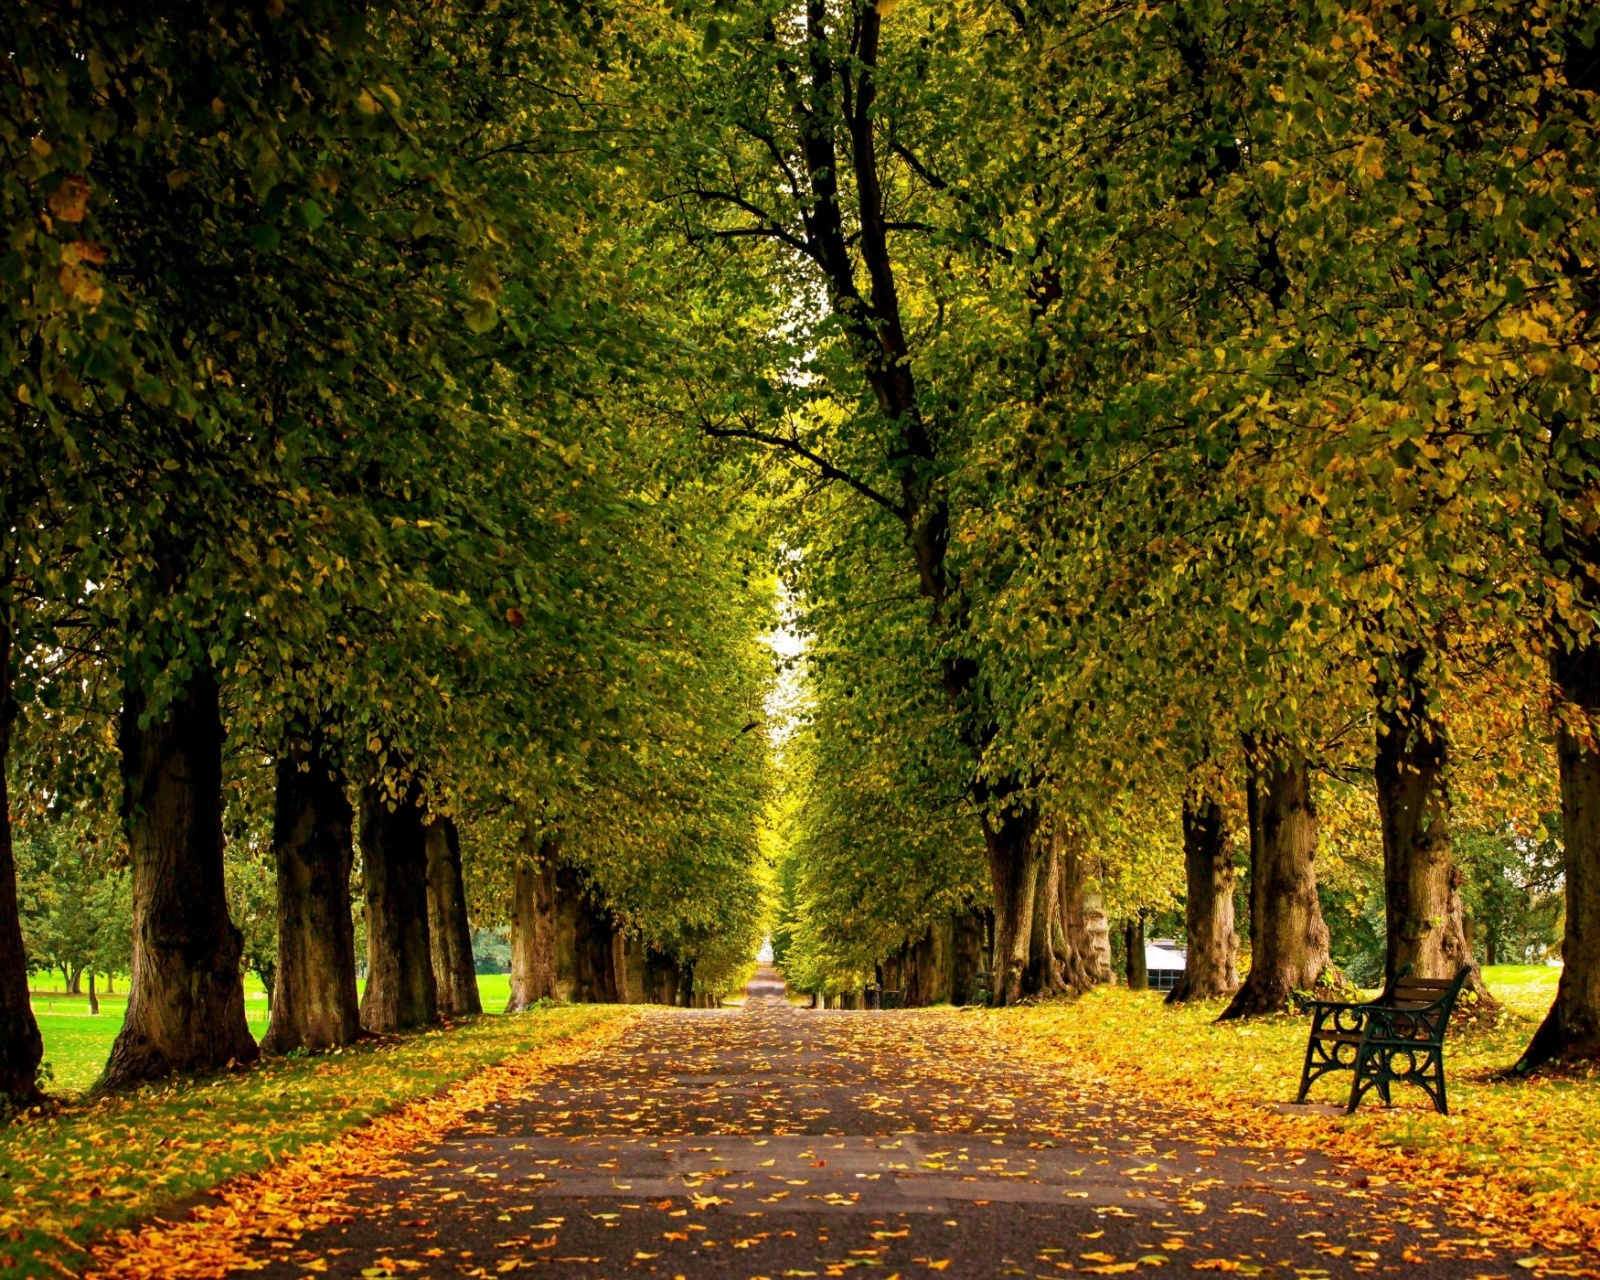 autumn trees hdr park leaves walk road colors wallpaper - [1600x1280]